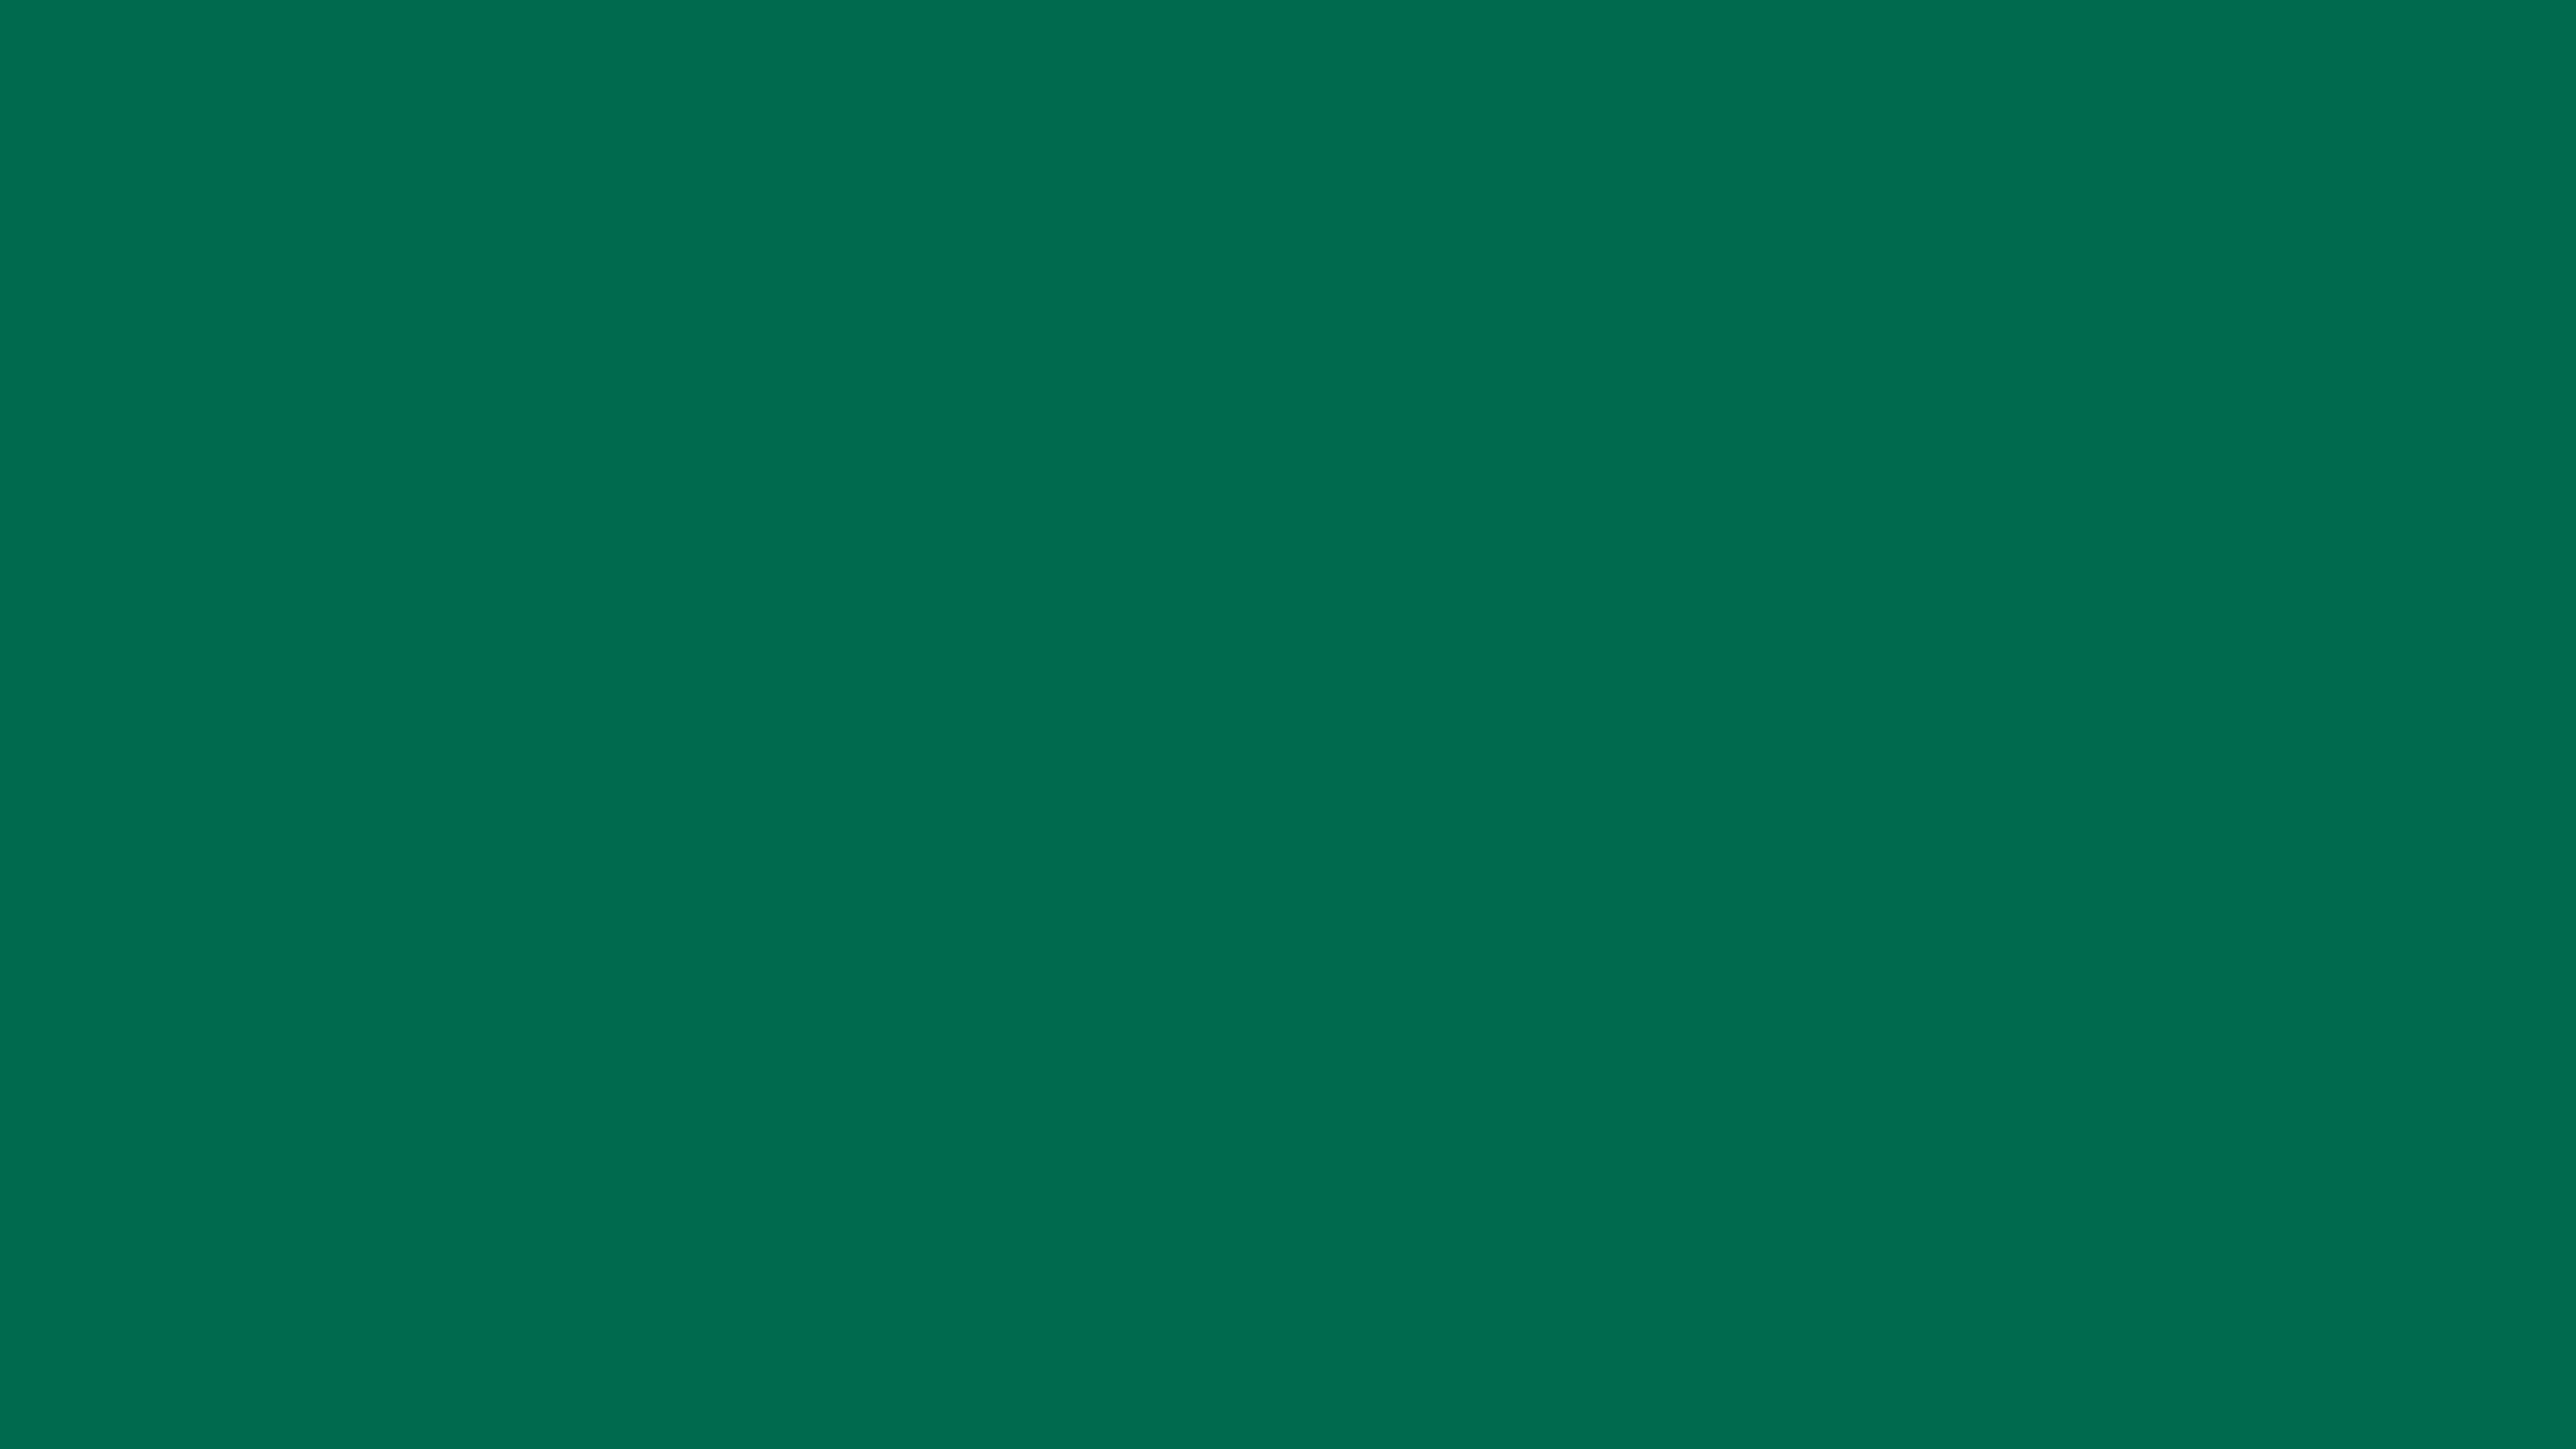 5120x2880 Bottle Green Solid Color Background